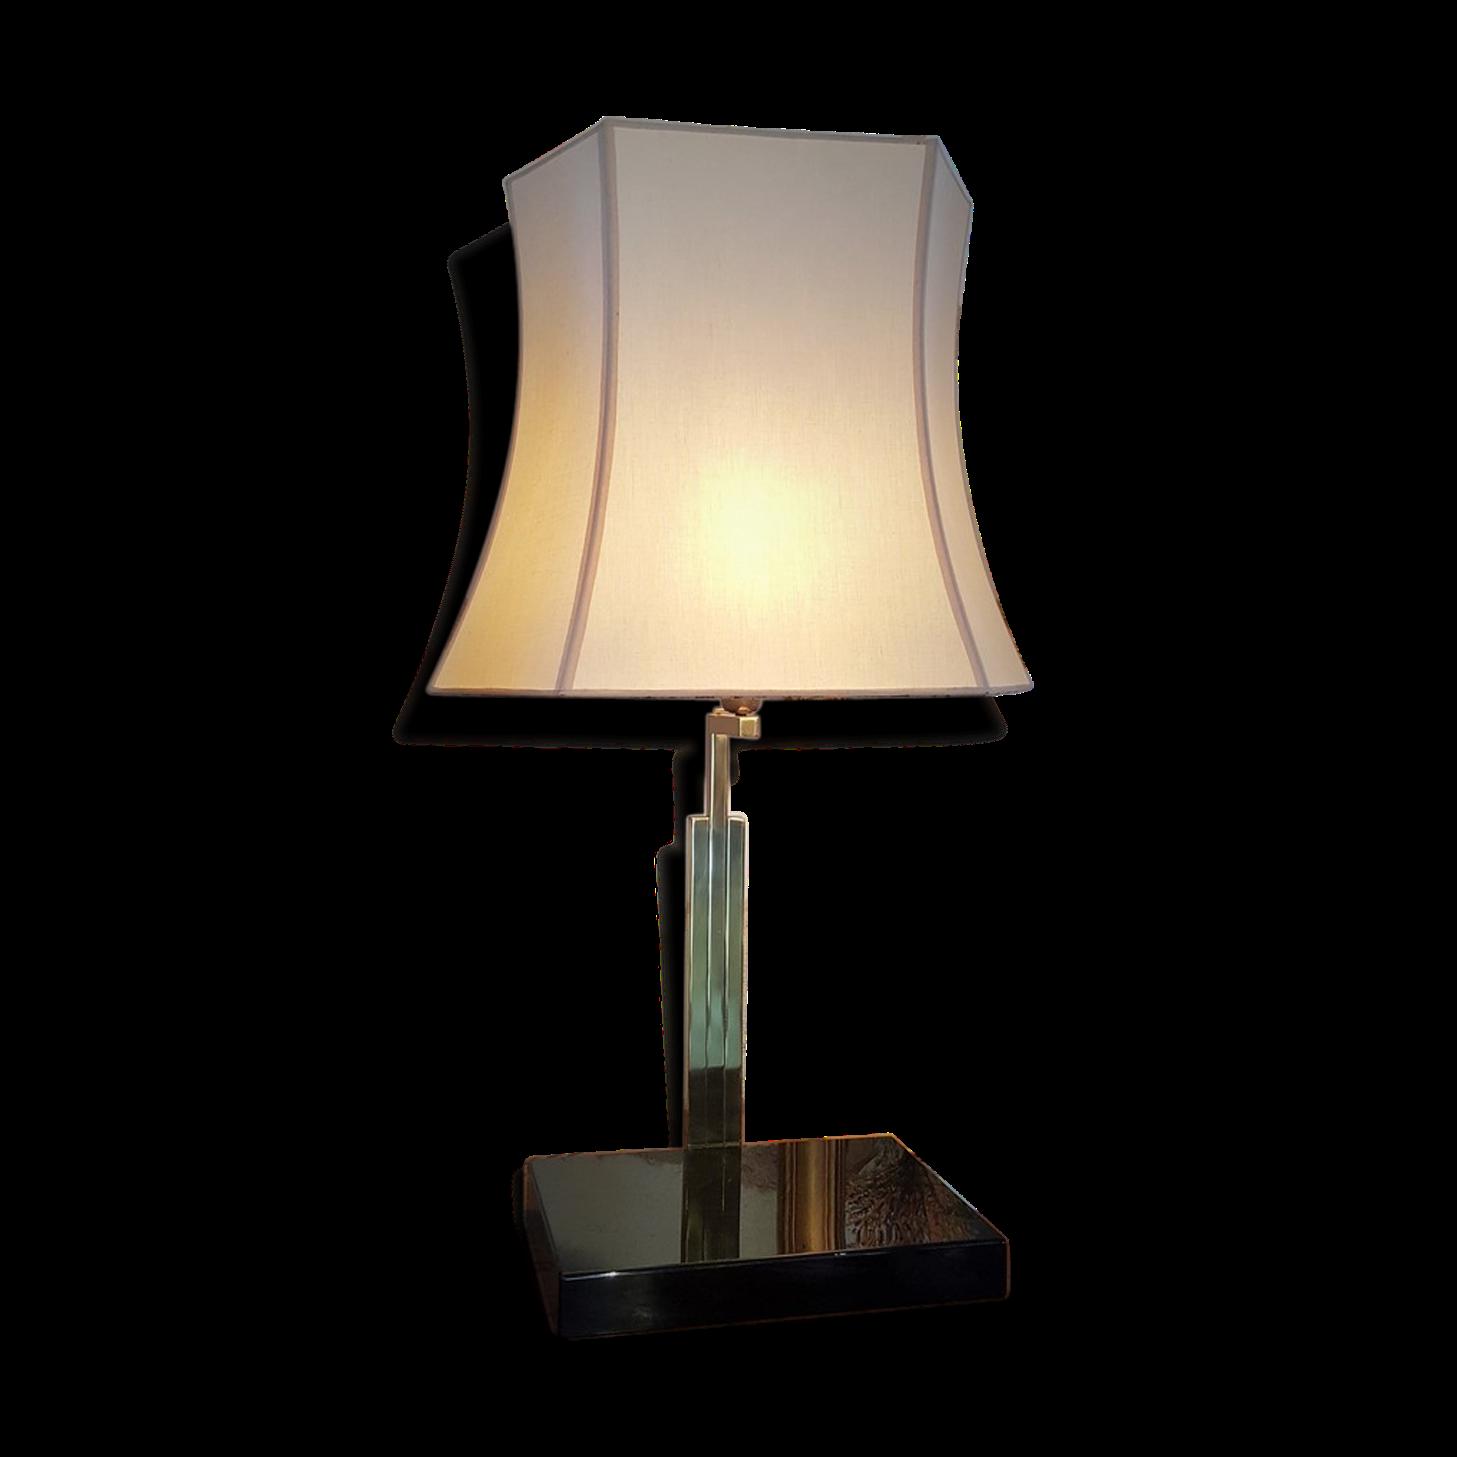 roche bobois lampes sur pied. Black Bedroom Furniture Sets. Home Design Ideas